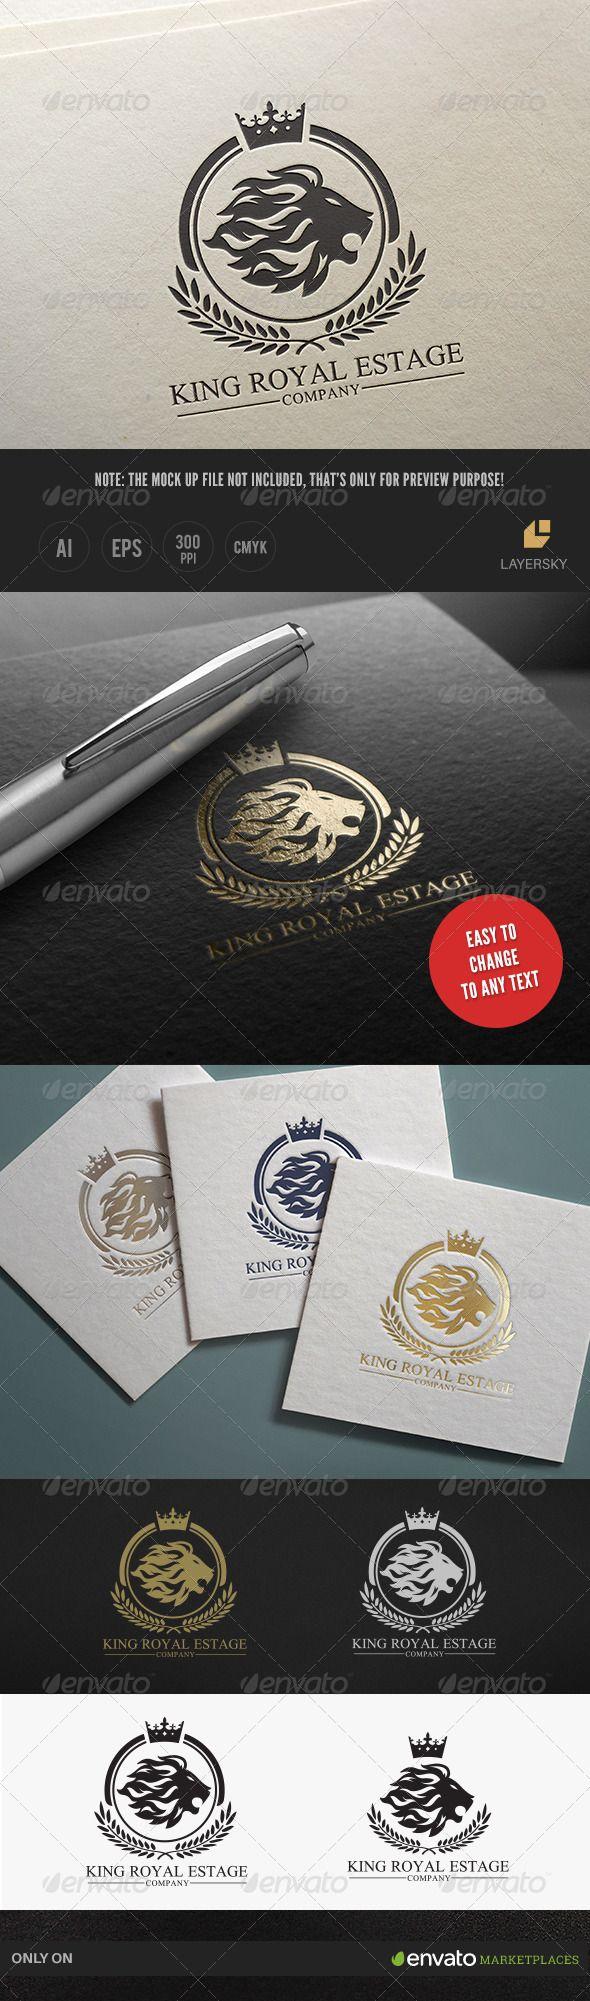 King Royal Estate Logo Template #design #logotype Download: http://graphicriver.net/item/king-royal-estate-/7930978?ref=ksioks